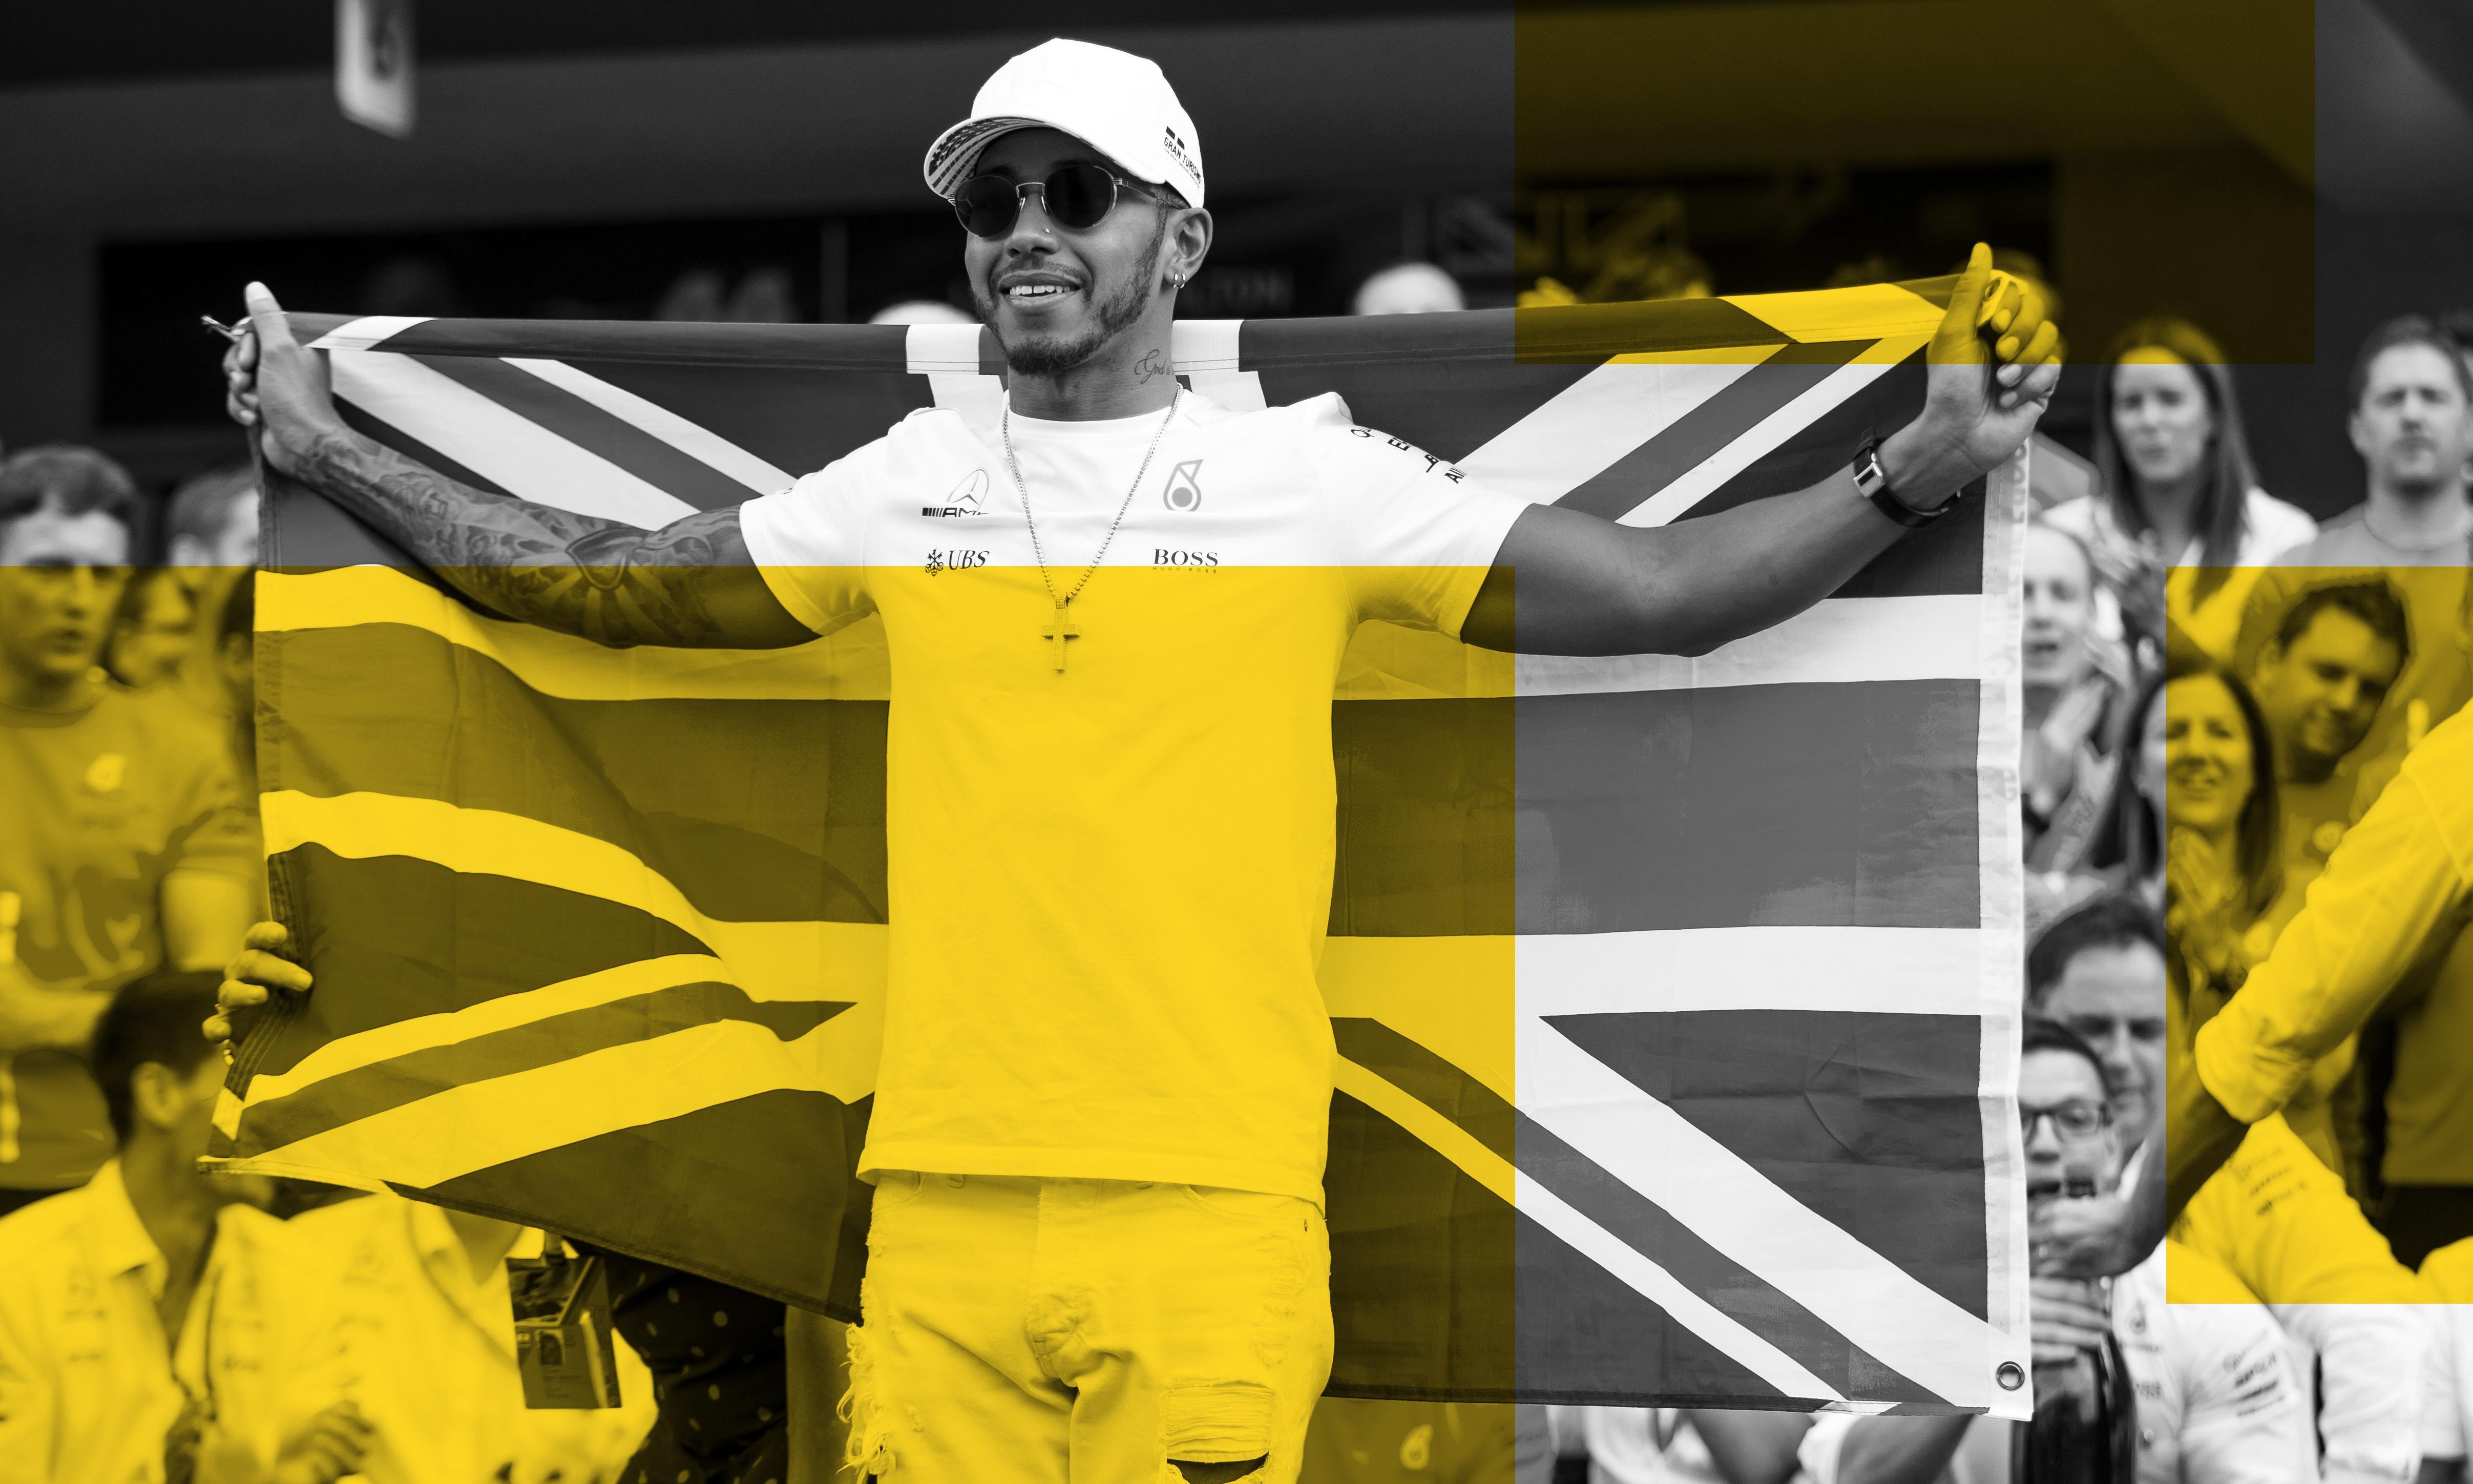 Lewis Hamilton avoided taxes on £16.5m jet using Isle of Man scheme